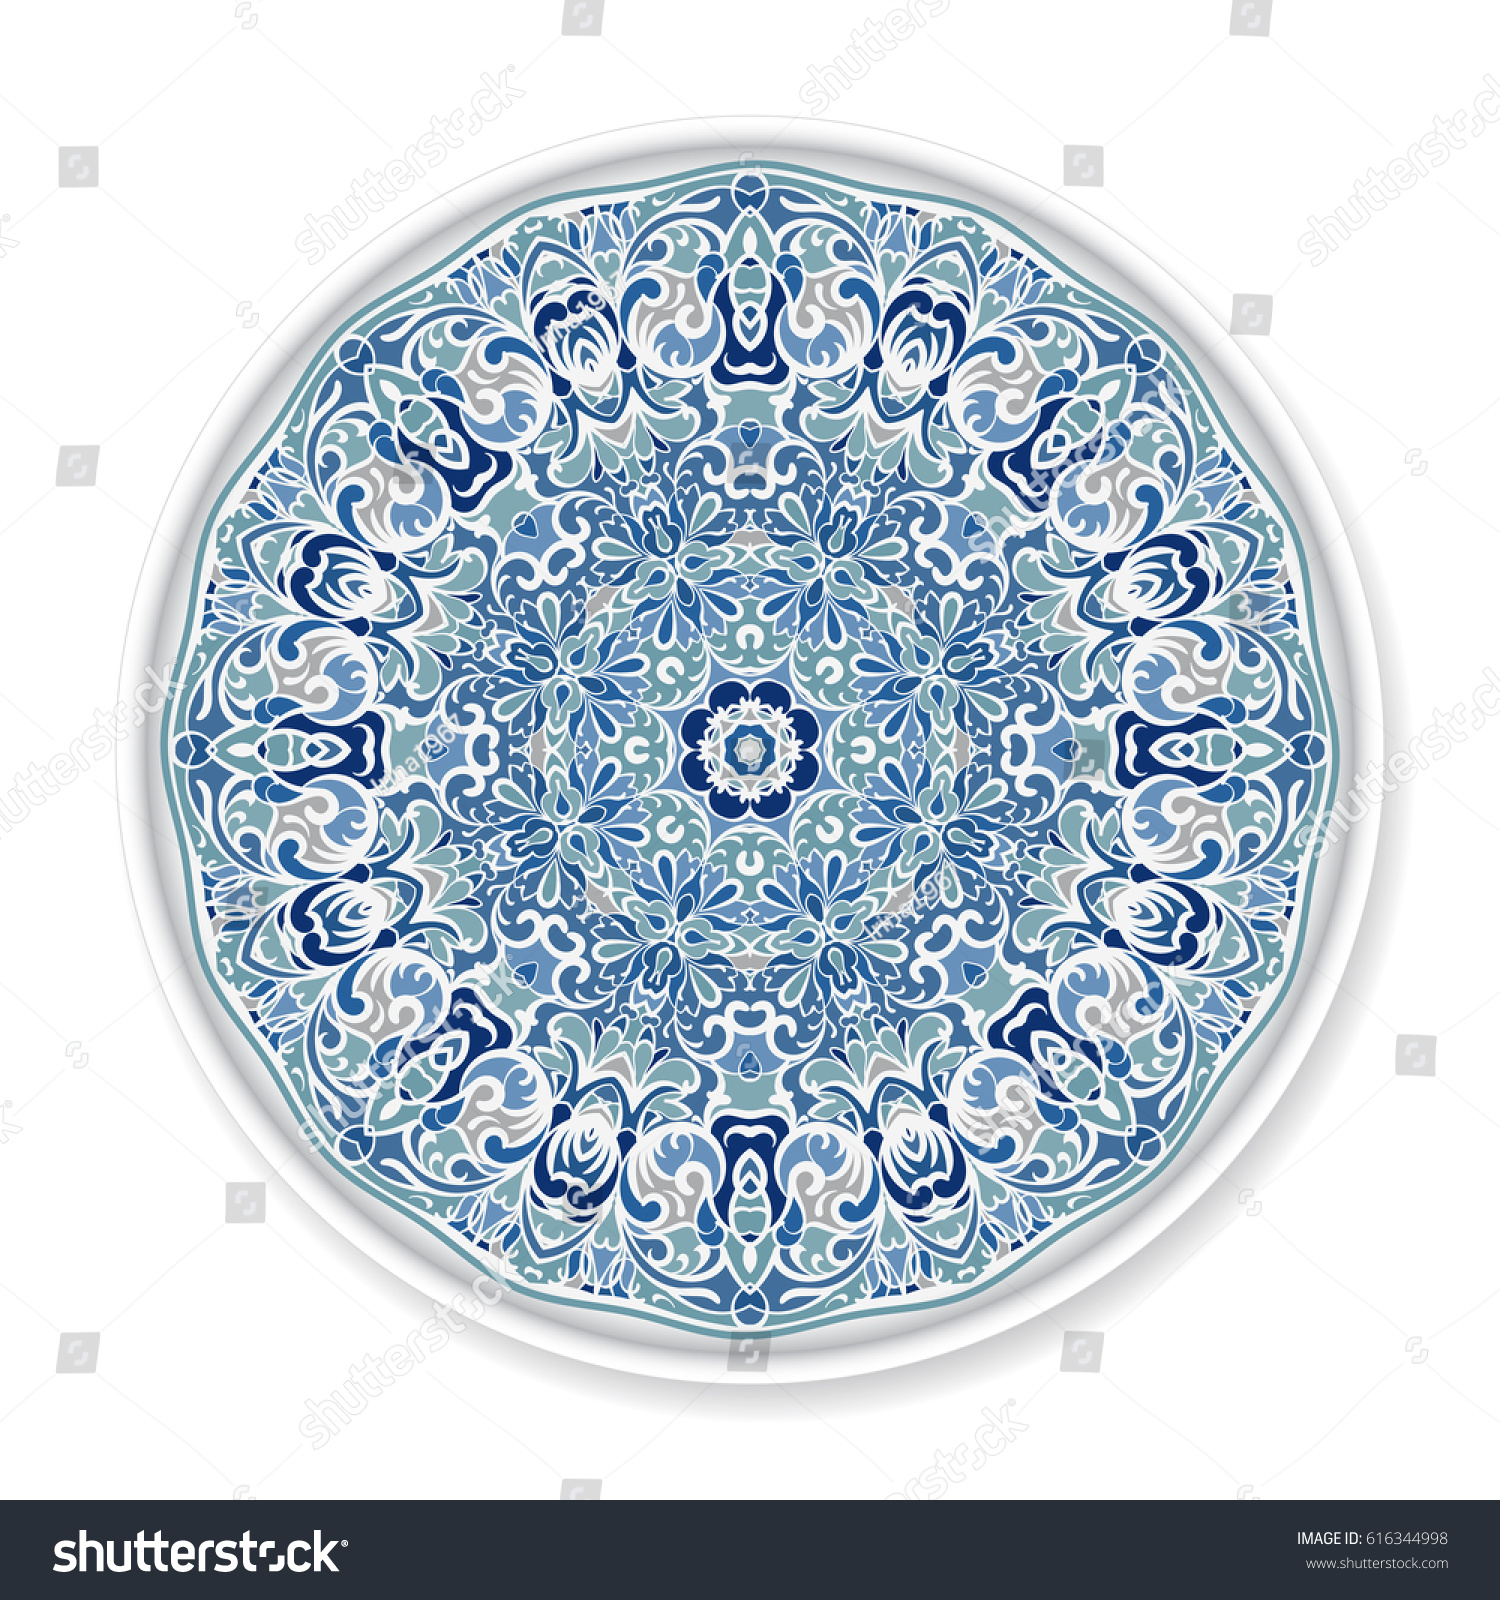 Decorative Plate Round Ornament Ethnic Style Stock Vector